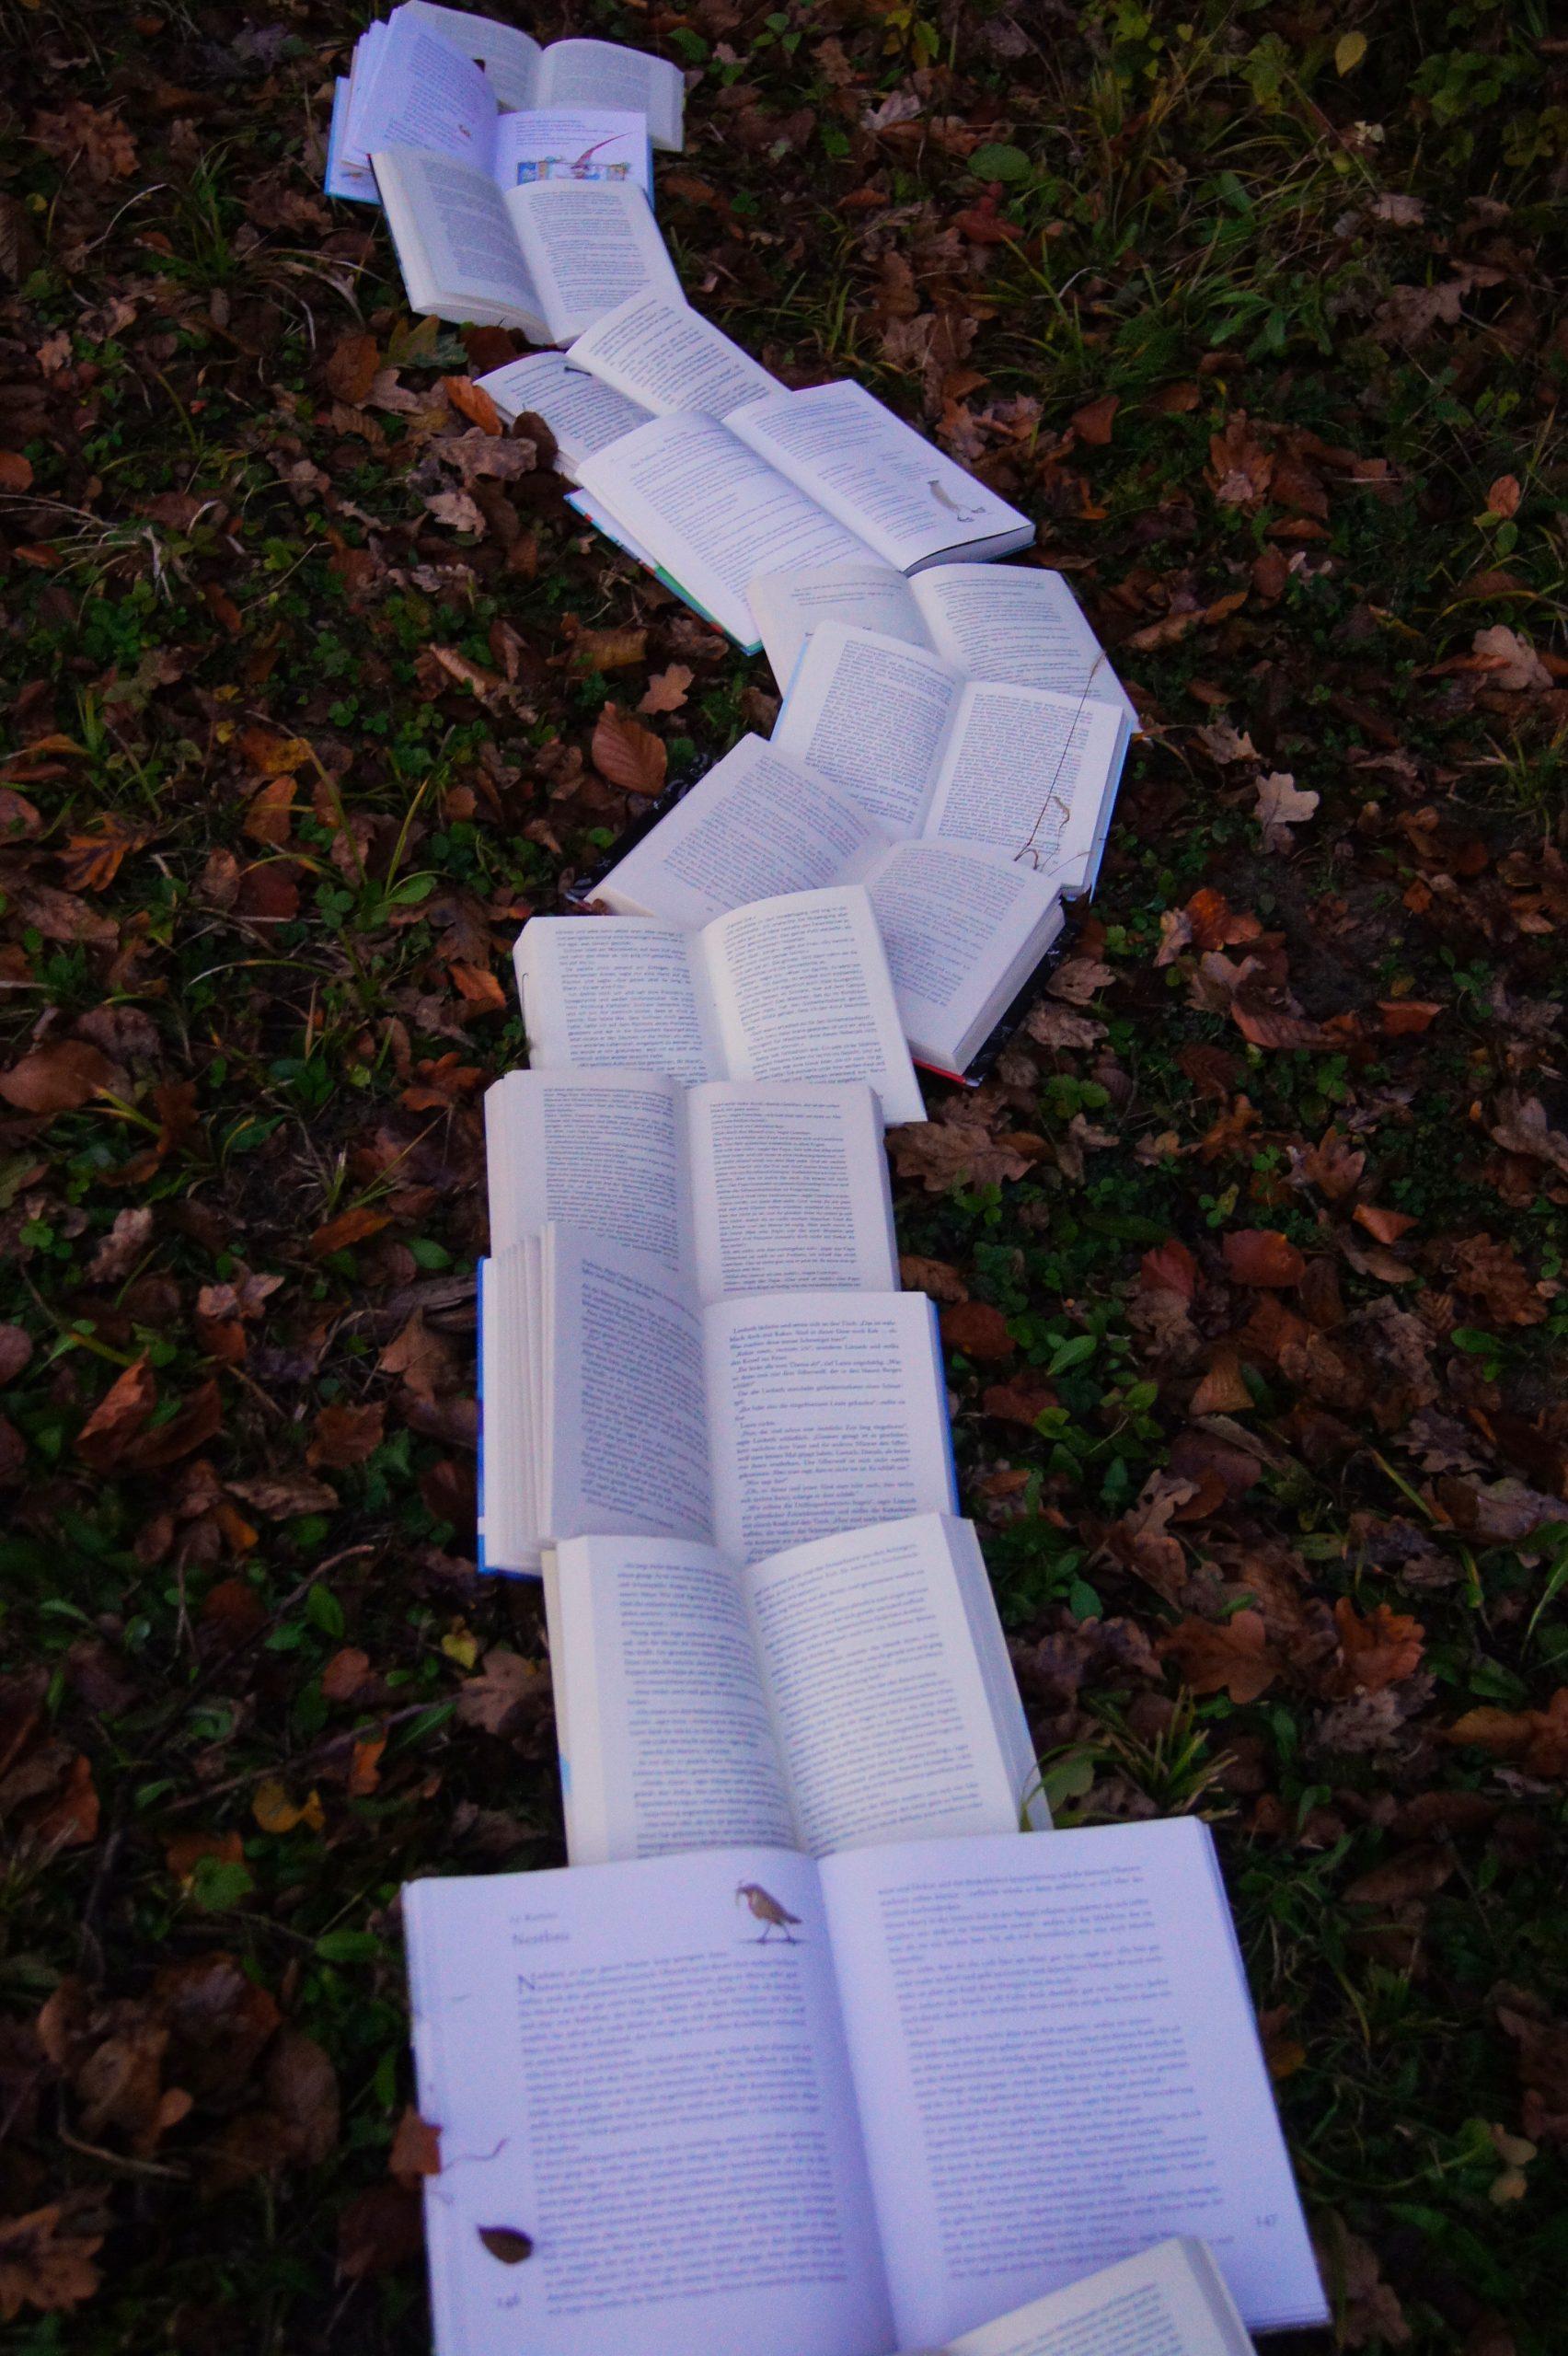 books on ground